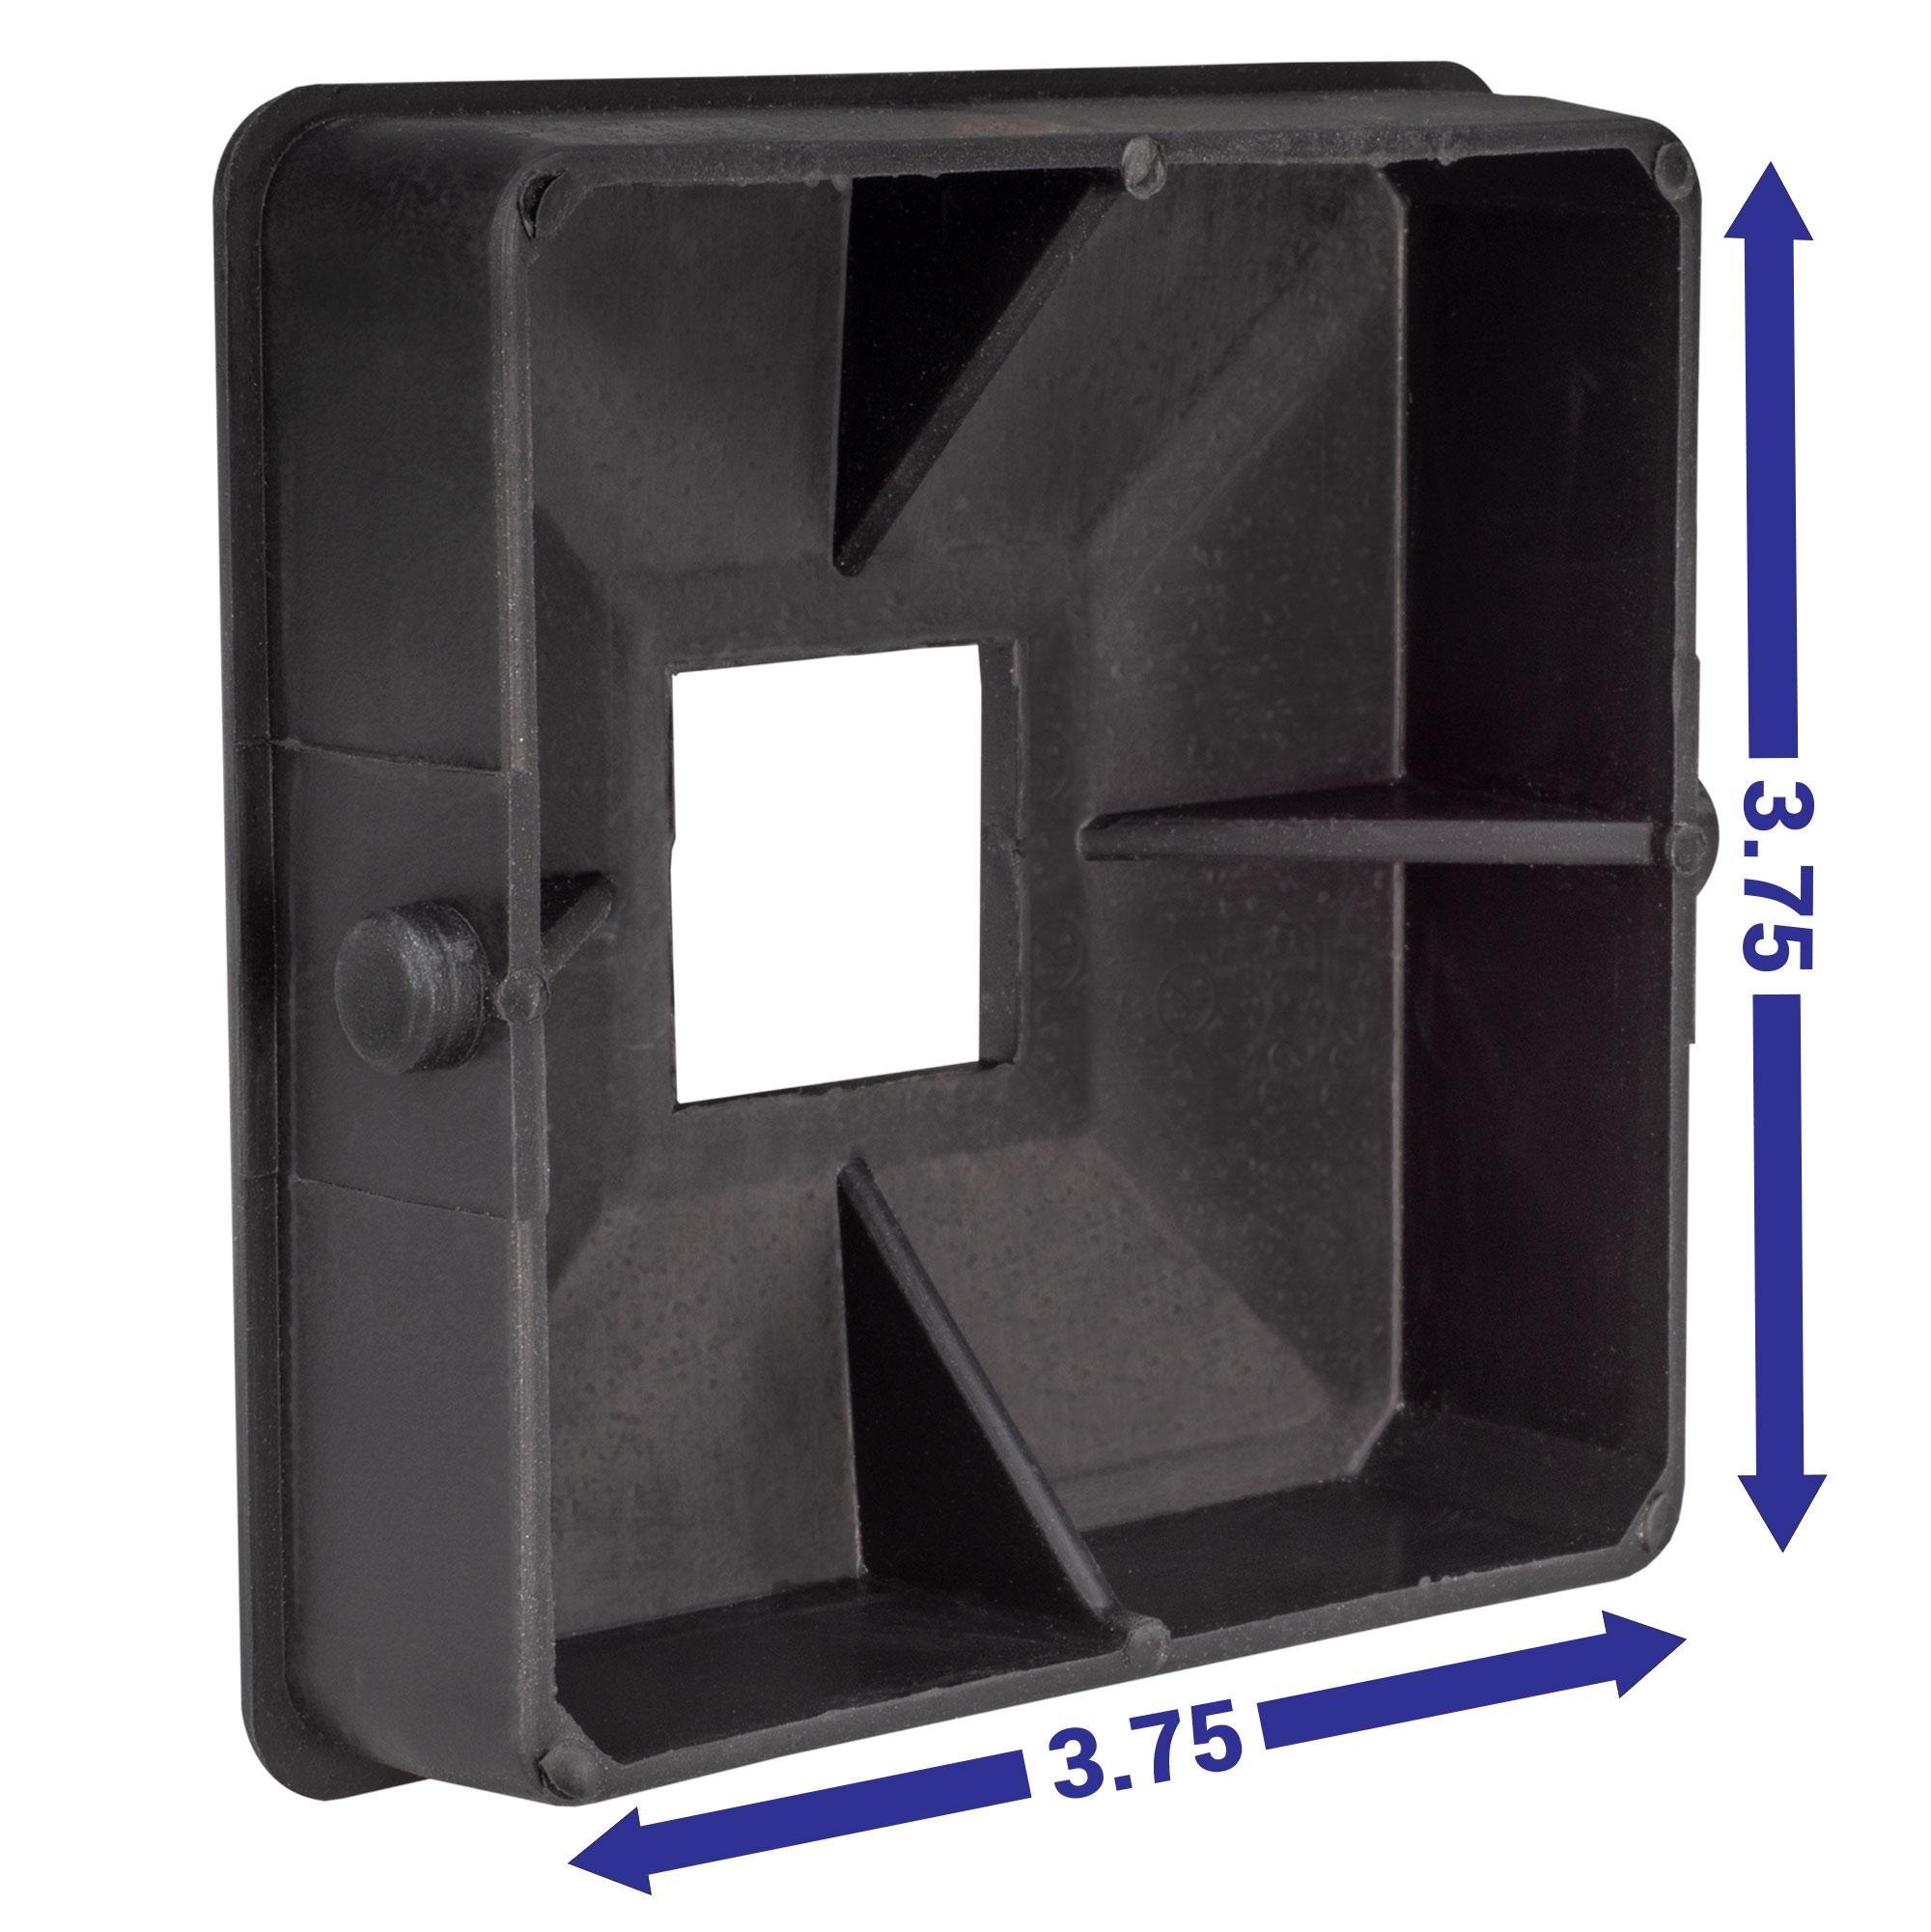 bumper-plug-back-w-measurement-graphics.jpg